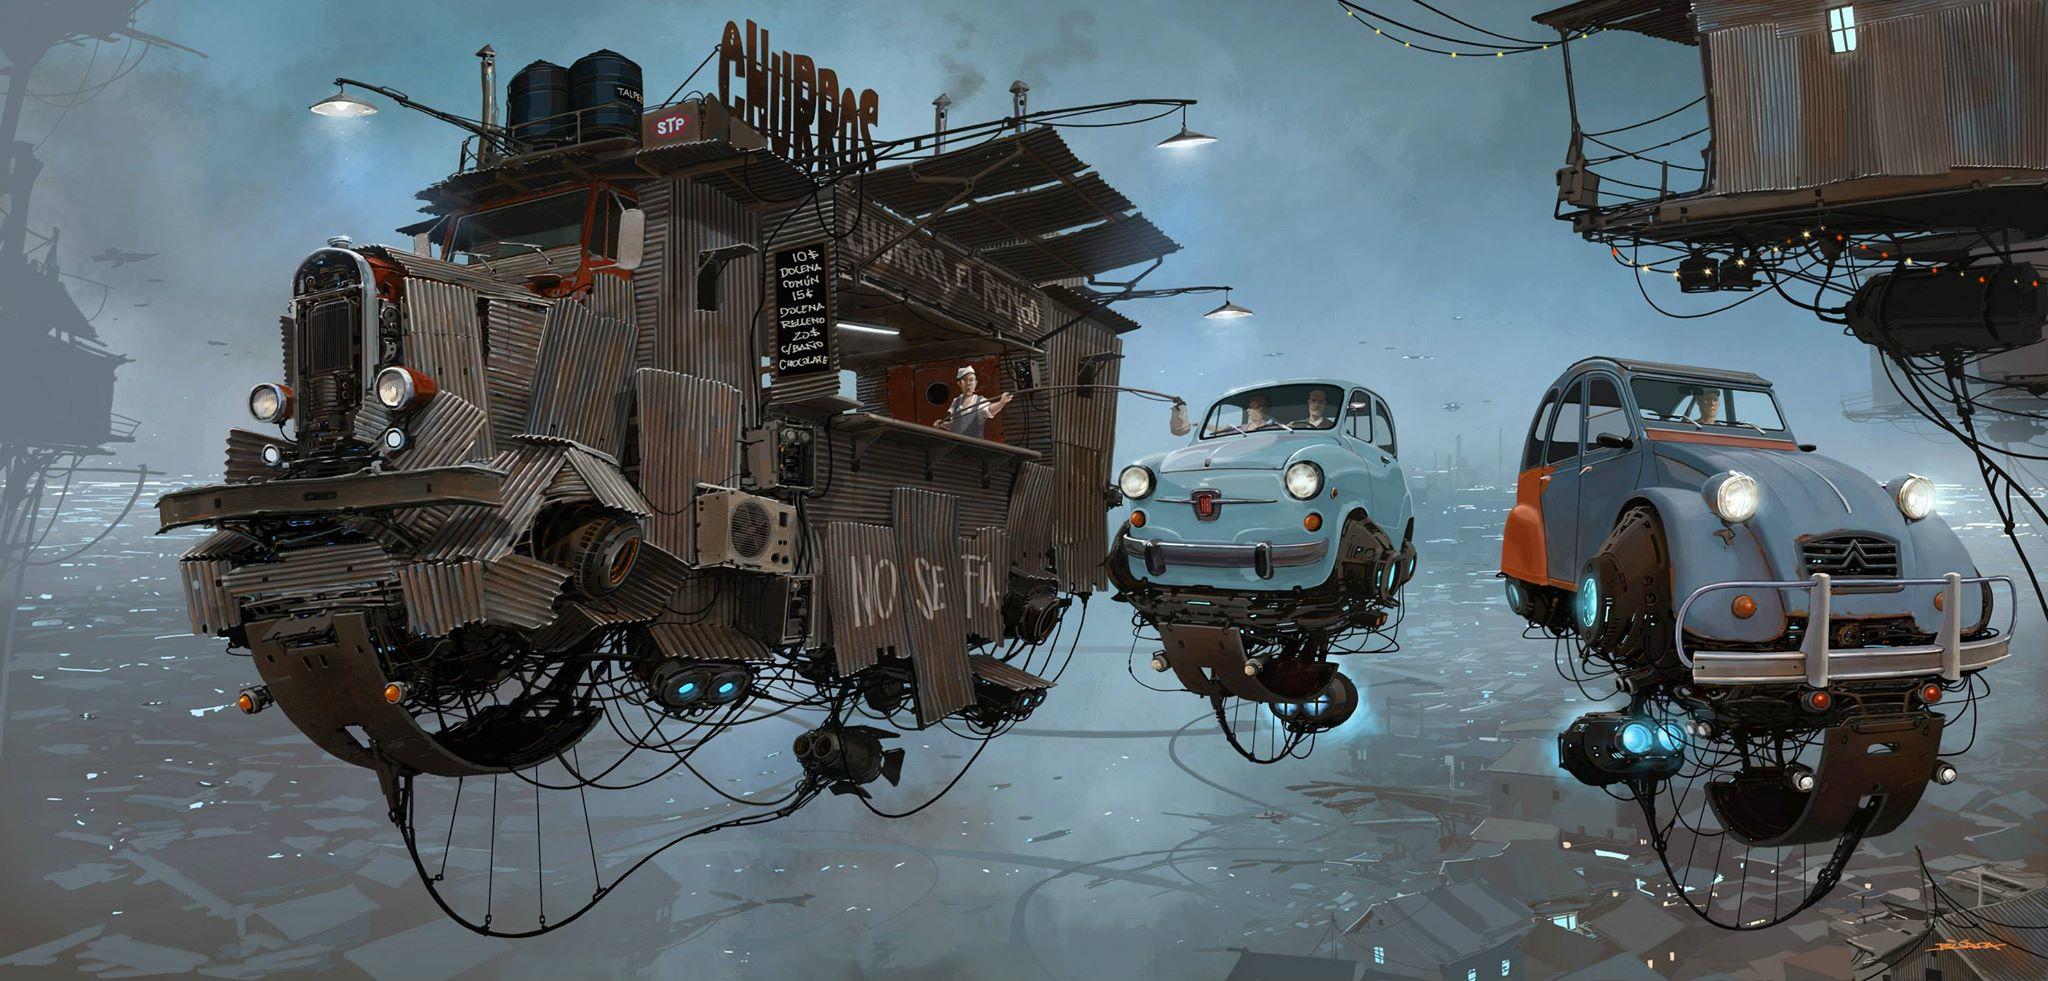 Digital Artist Creates Quot Universe Scrap Quot Where Classic Cars